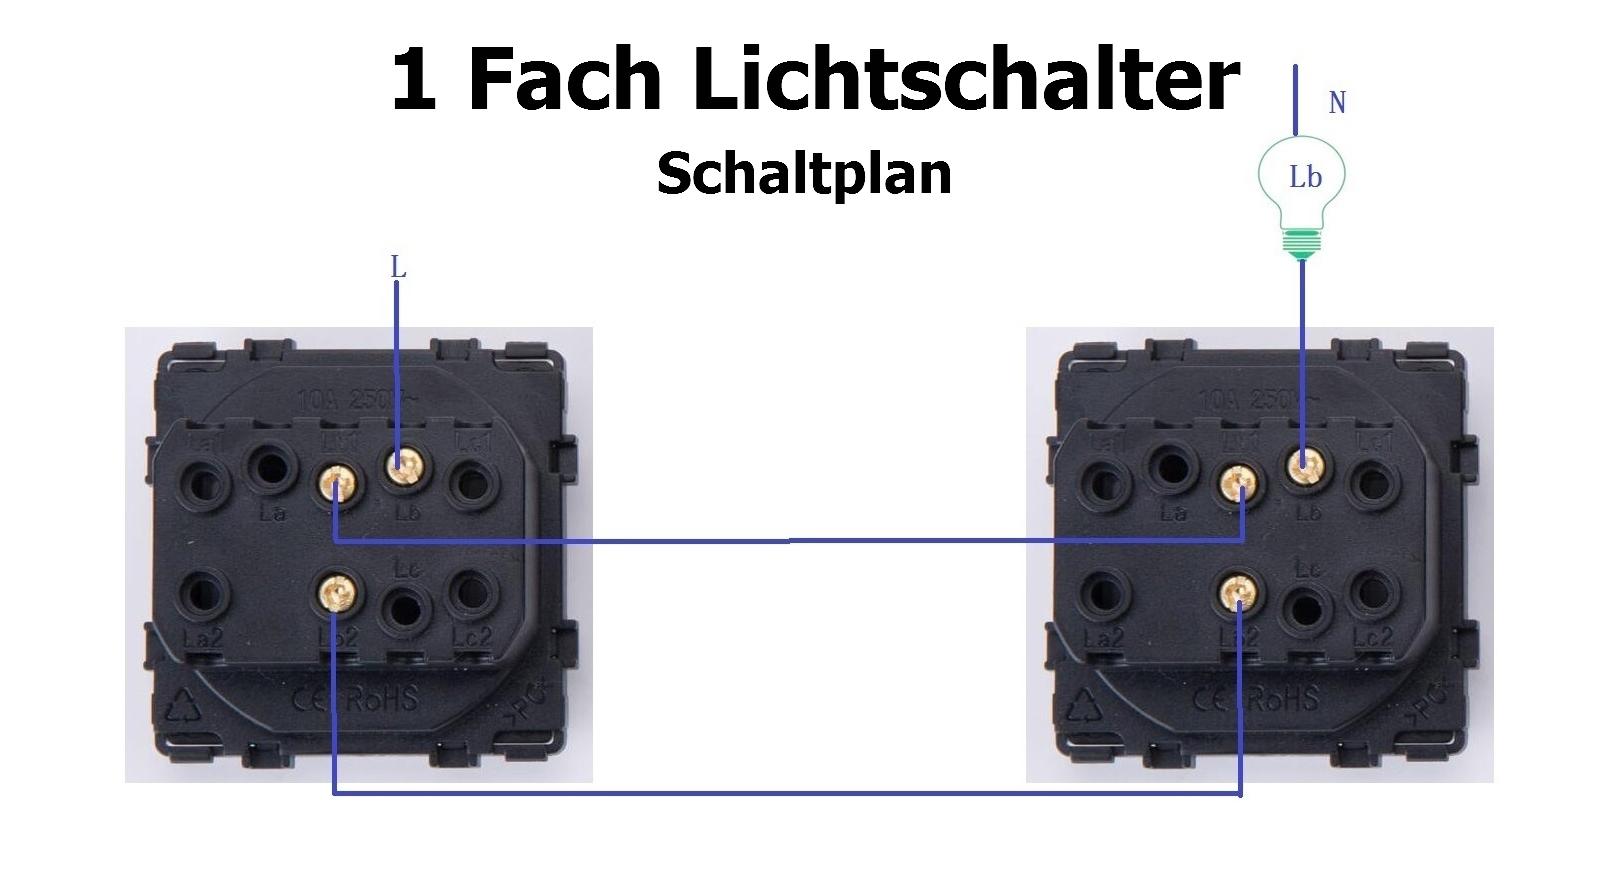 https://lichtschalter24.shop/media/image/9d/6d/c3/1fschalt.jpg